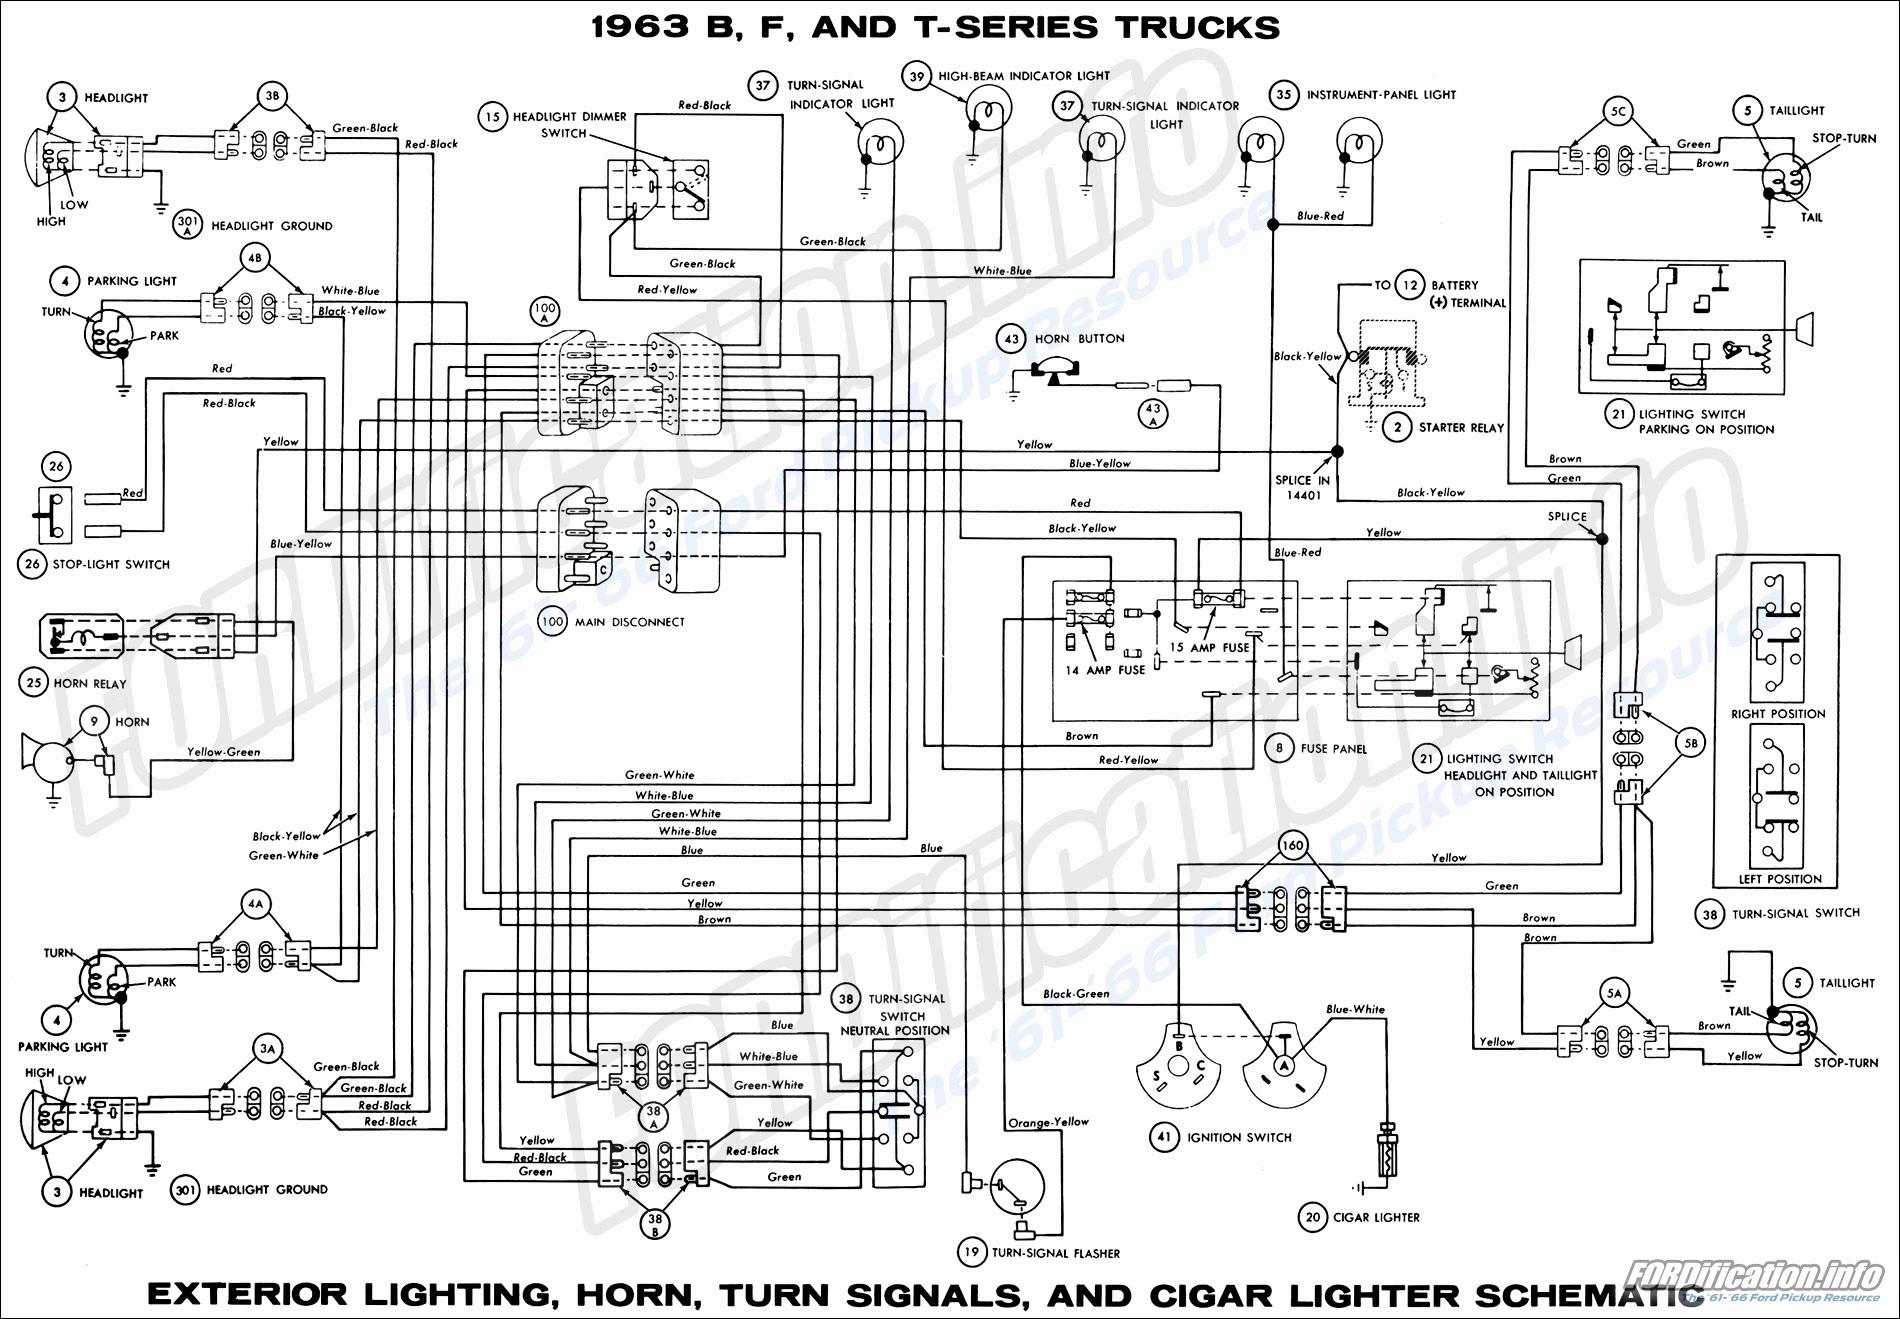 Speed Tech Lights Wiring Diagram   Wiring Diagram - Speed Tech Lights Wiring Diagram